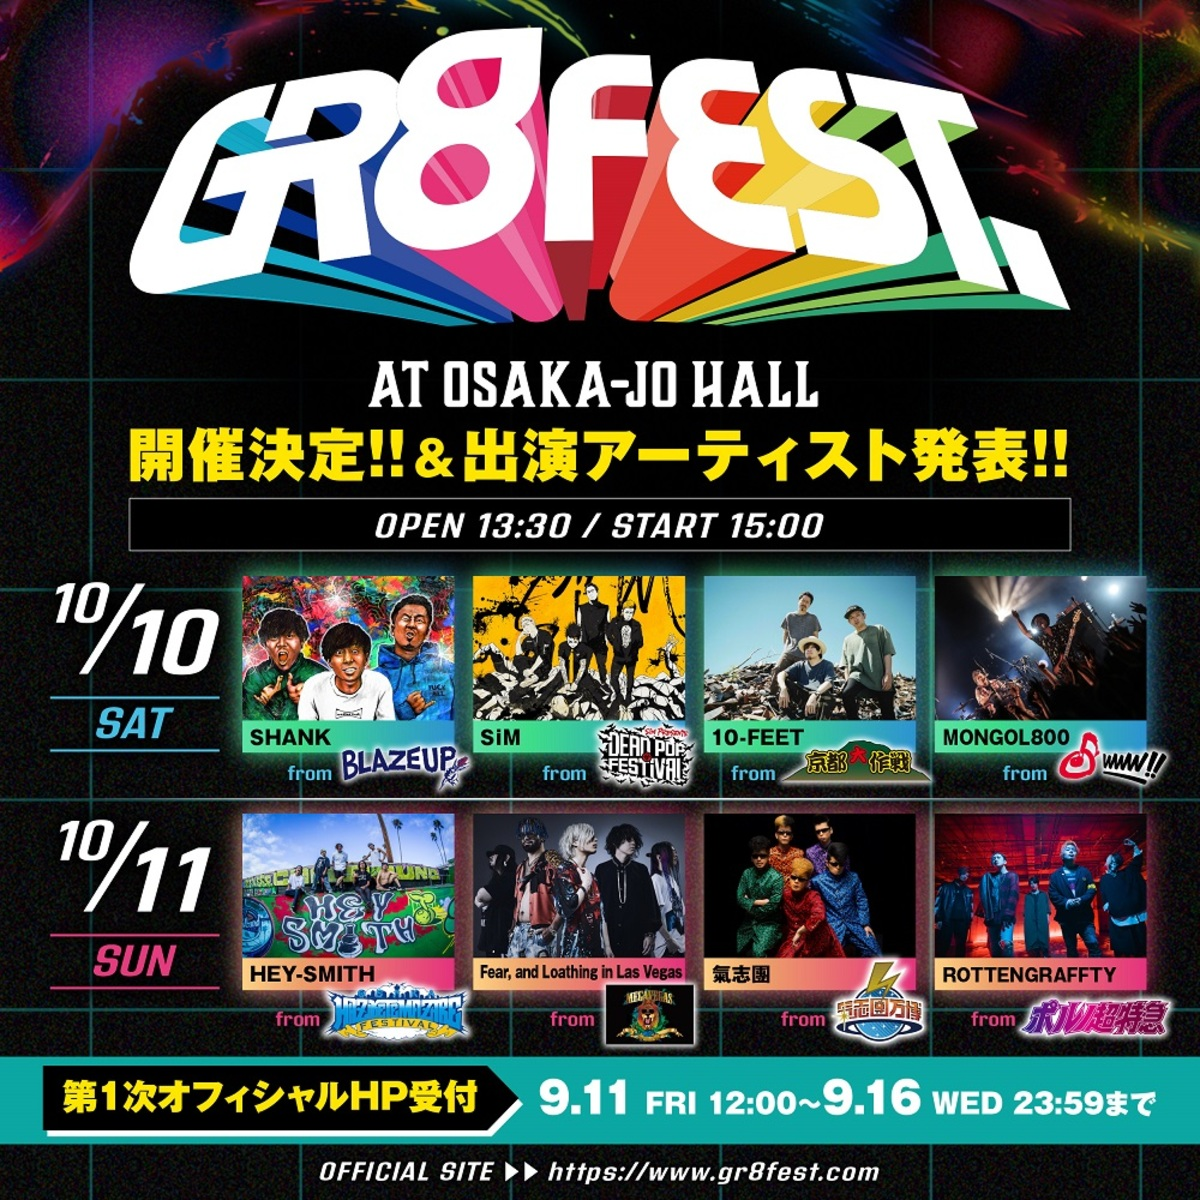 10 Feet Sim ヘイスミ ベガス ロットン Shankら それぞれフェスを主催するアーティストたちが大阪に集結 Gr8 Fest At Osaka Jo Hall 開催決定 激ロック ニュース